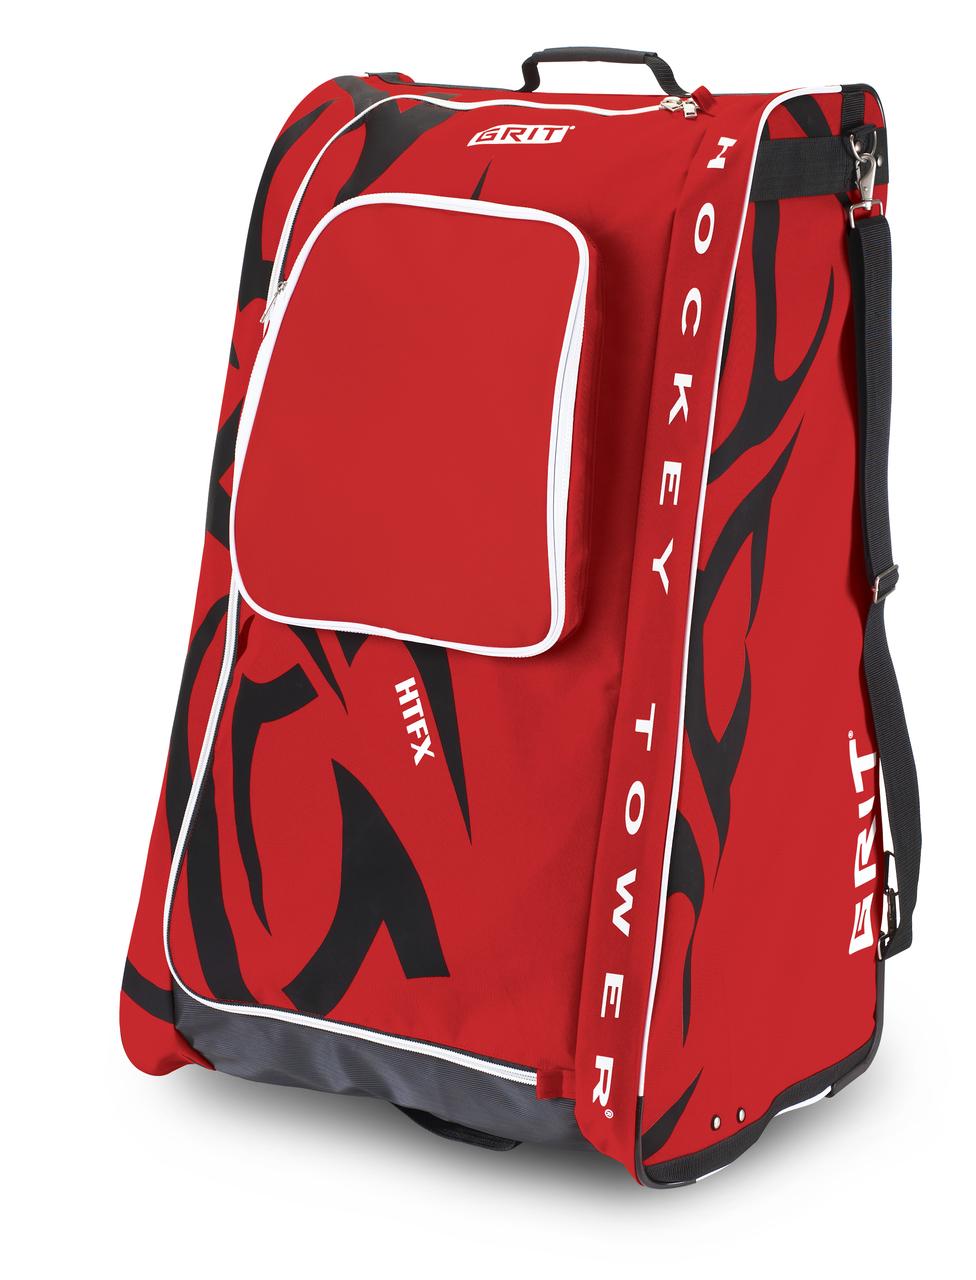 HTFX Hockey Tower Bag